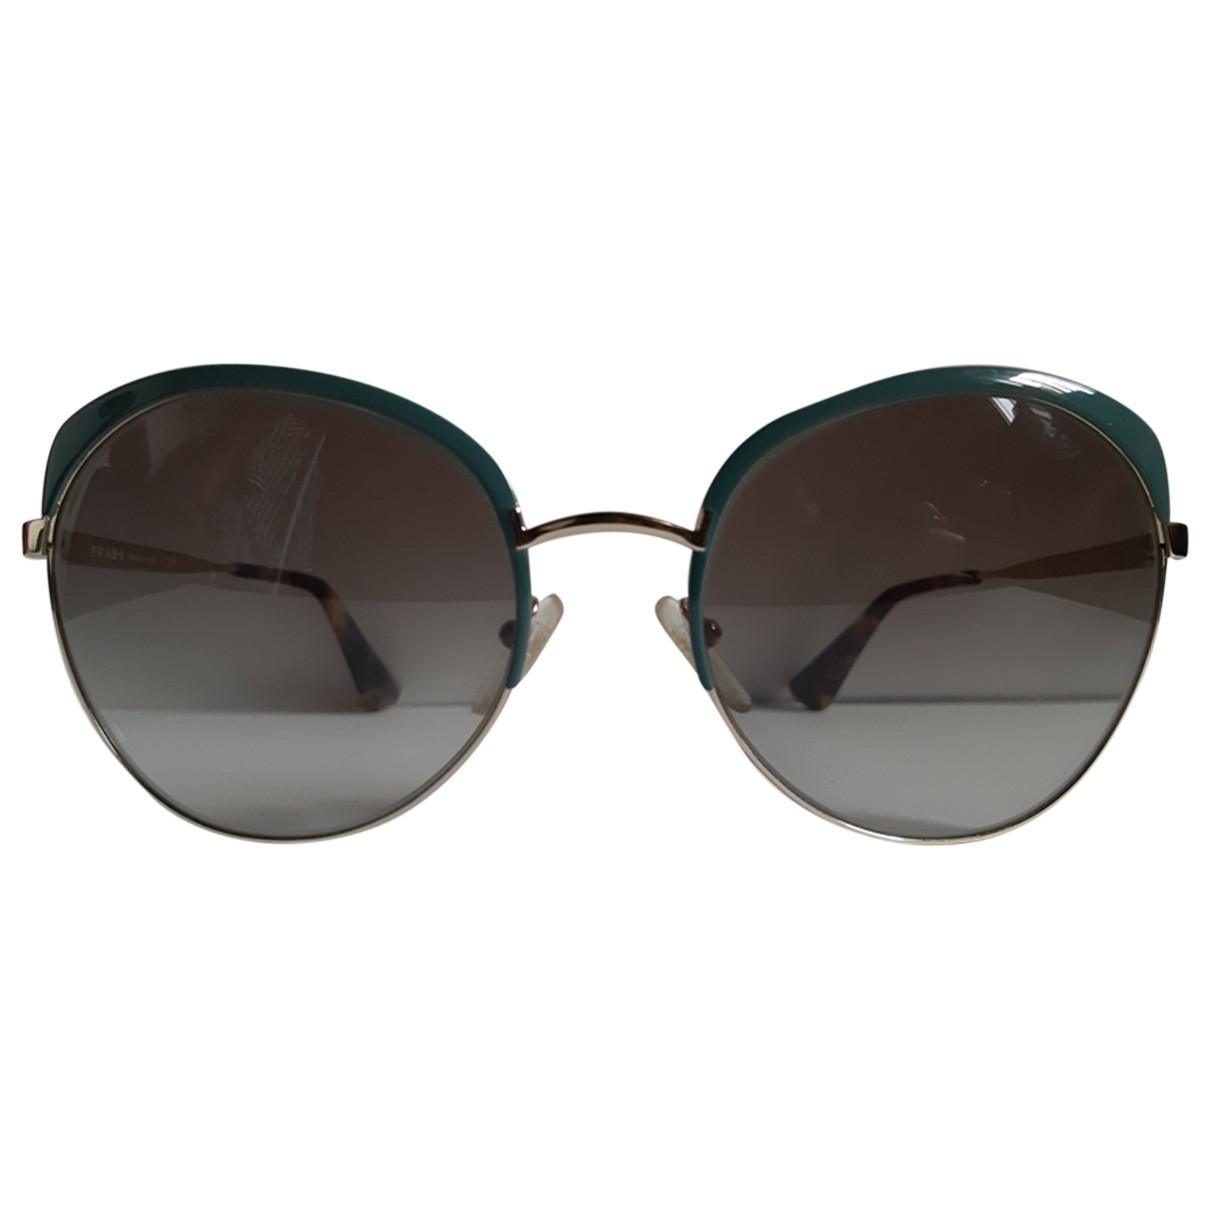 Prada \N Sonnenbrillen in  Gruen Metall